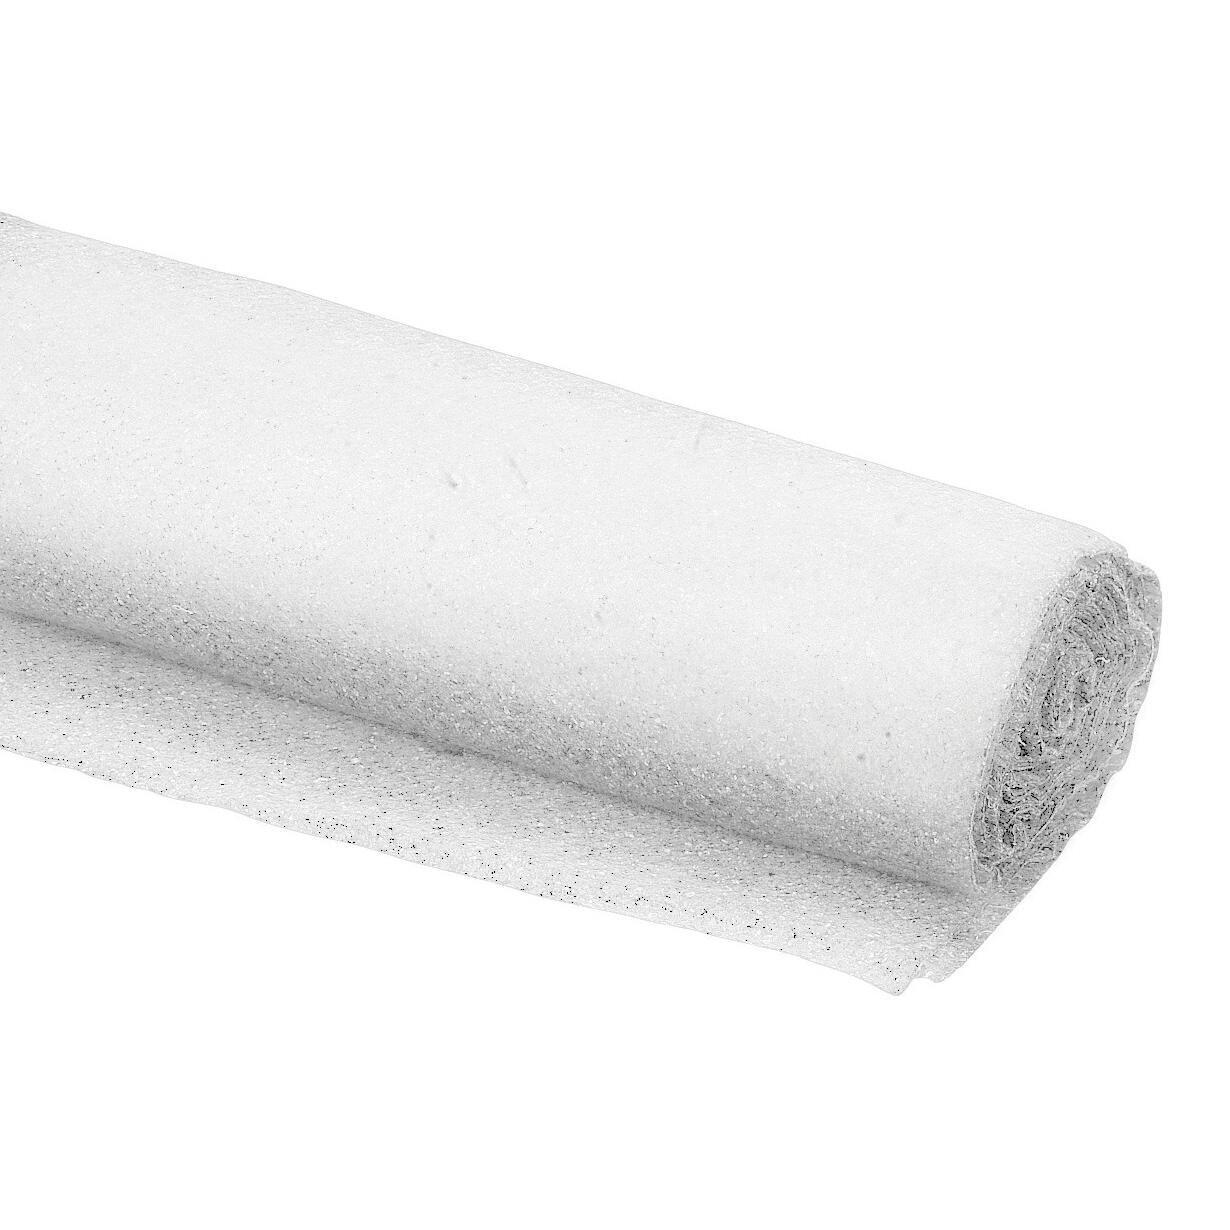 Telo feltro DEXTER antiscivolo 1 X 0.11 m bianco